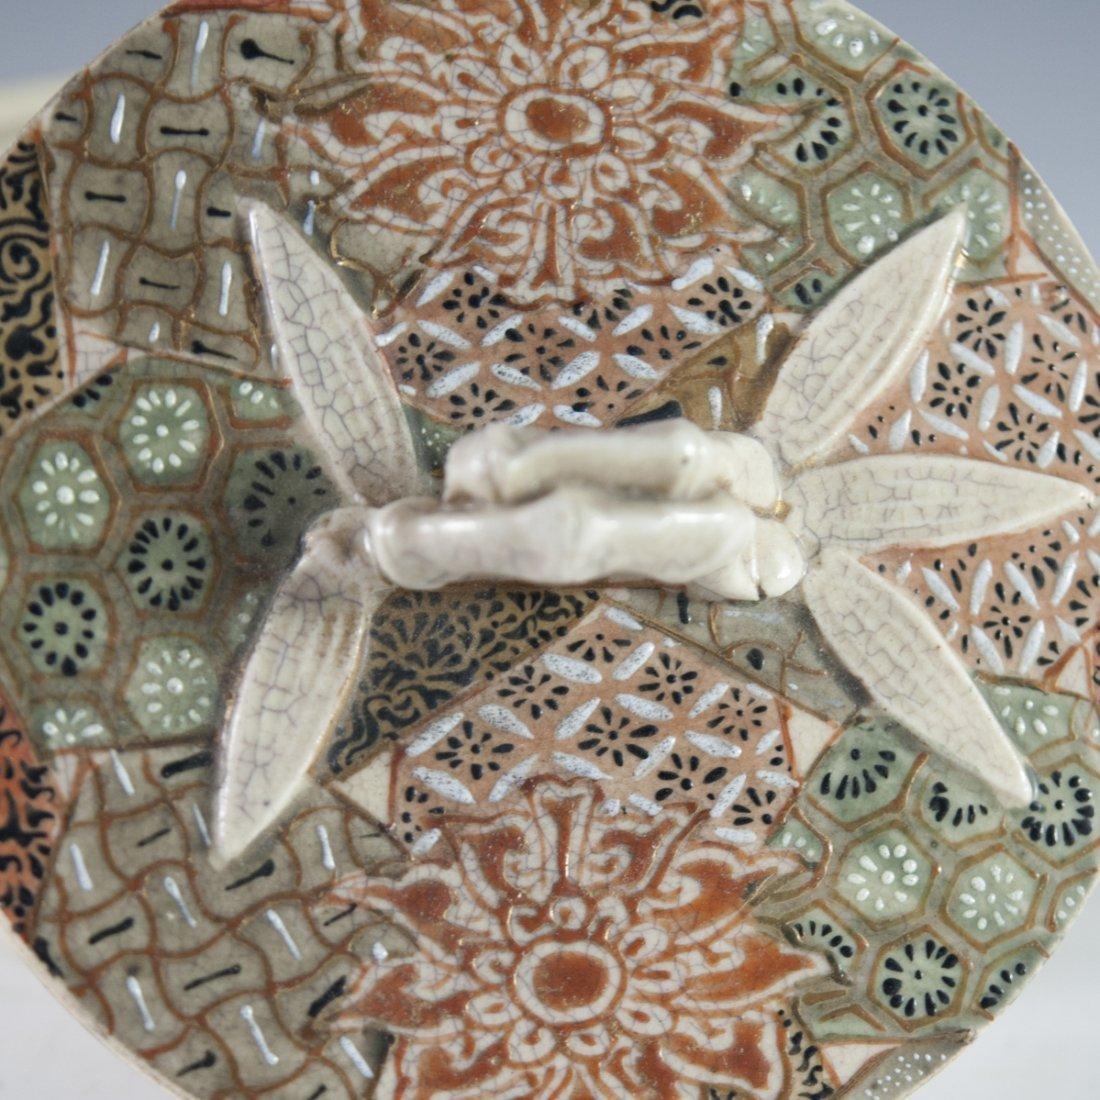 Antique Japanese Satsuma Porcelain Box - 4